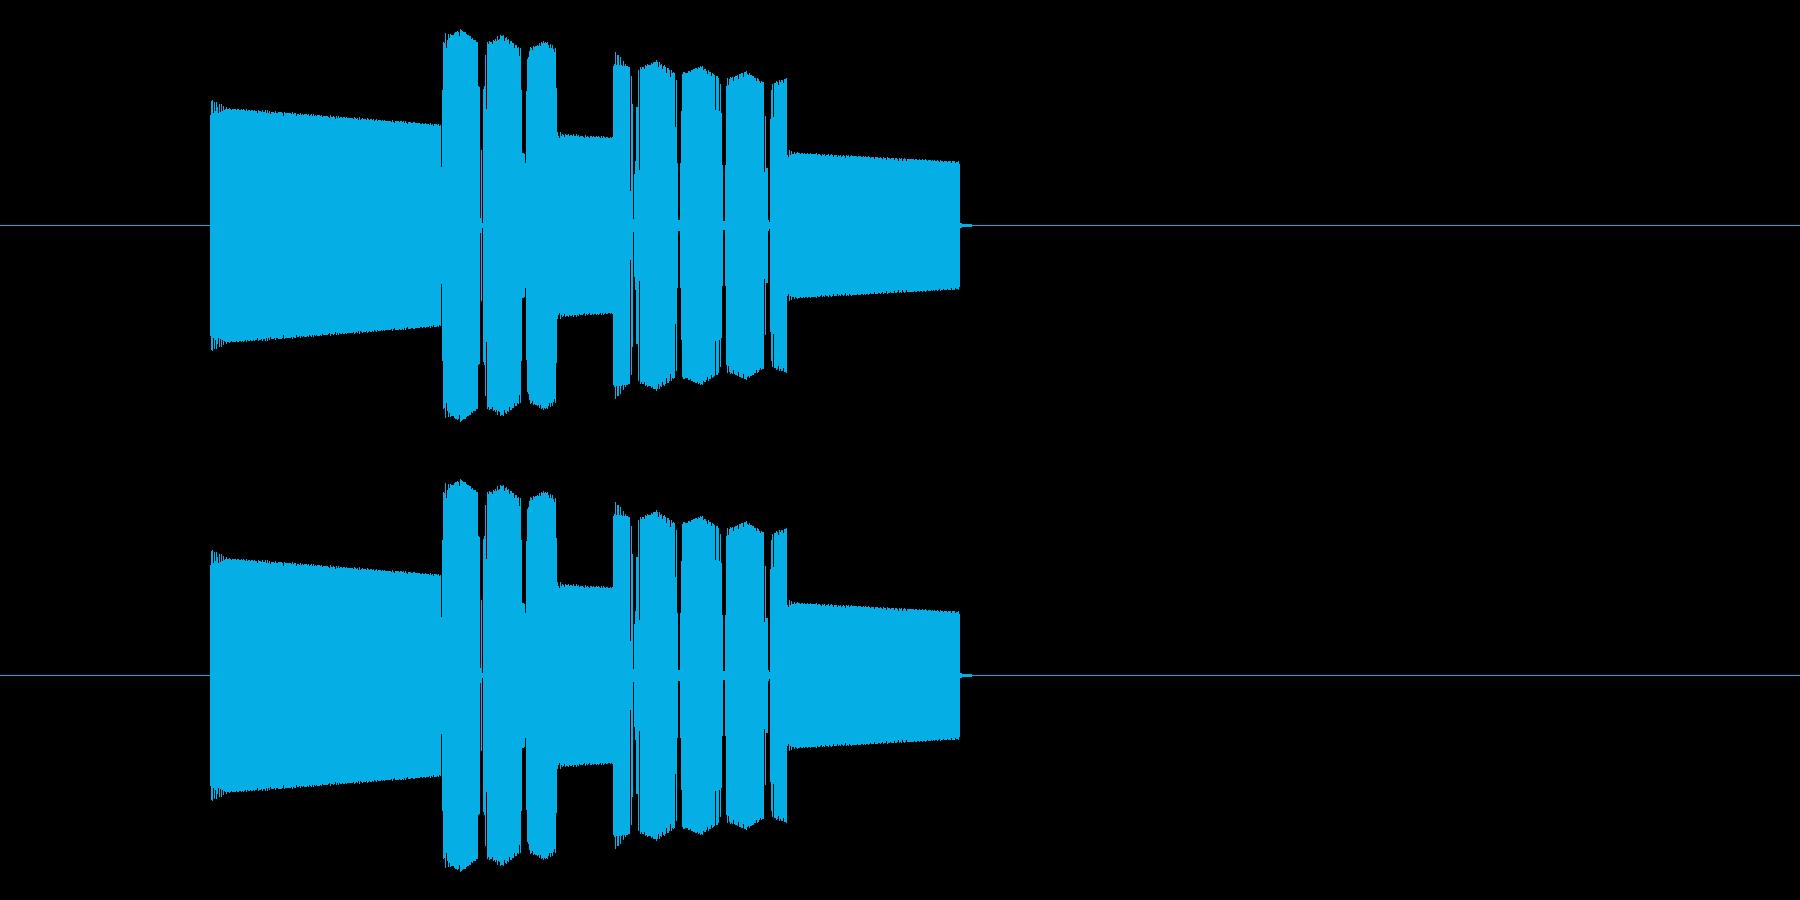 RPGゲーム・攻撃・ミス・空振り・高音の再生済みの波形